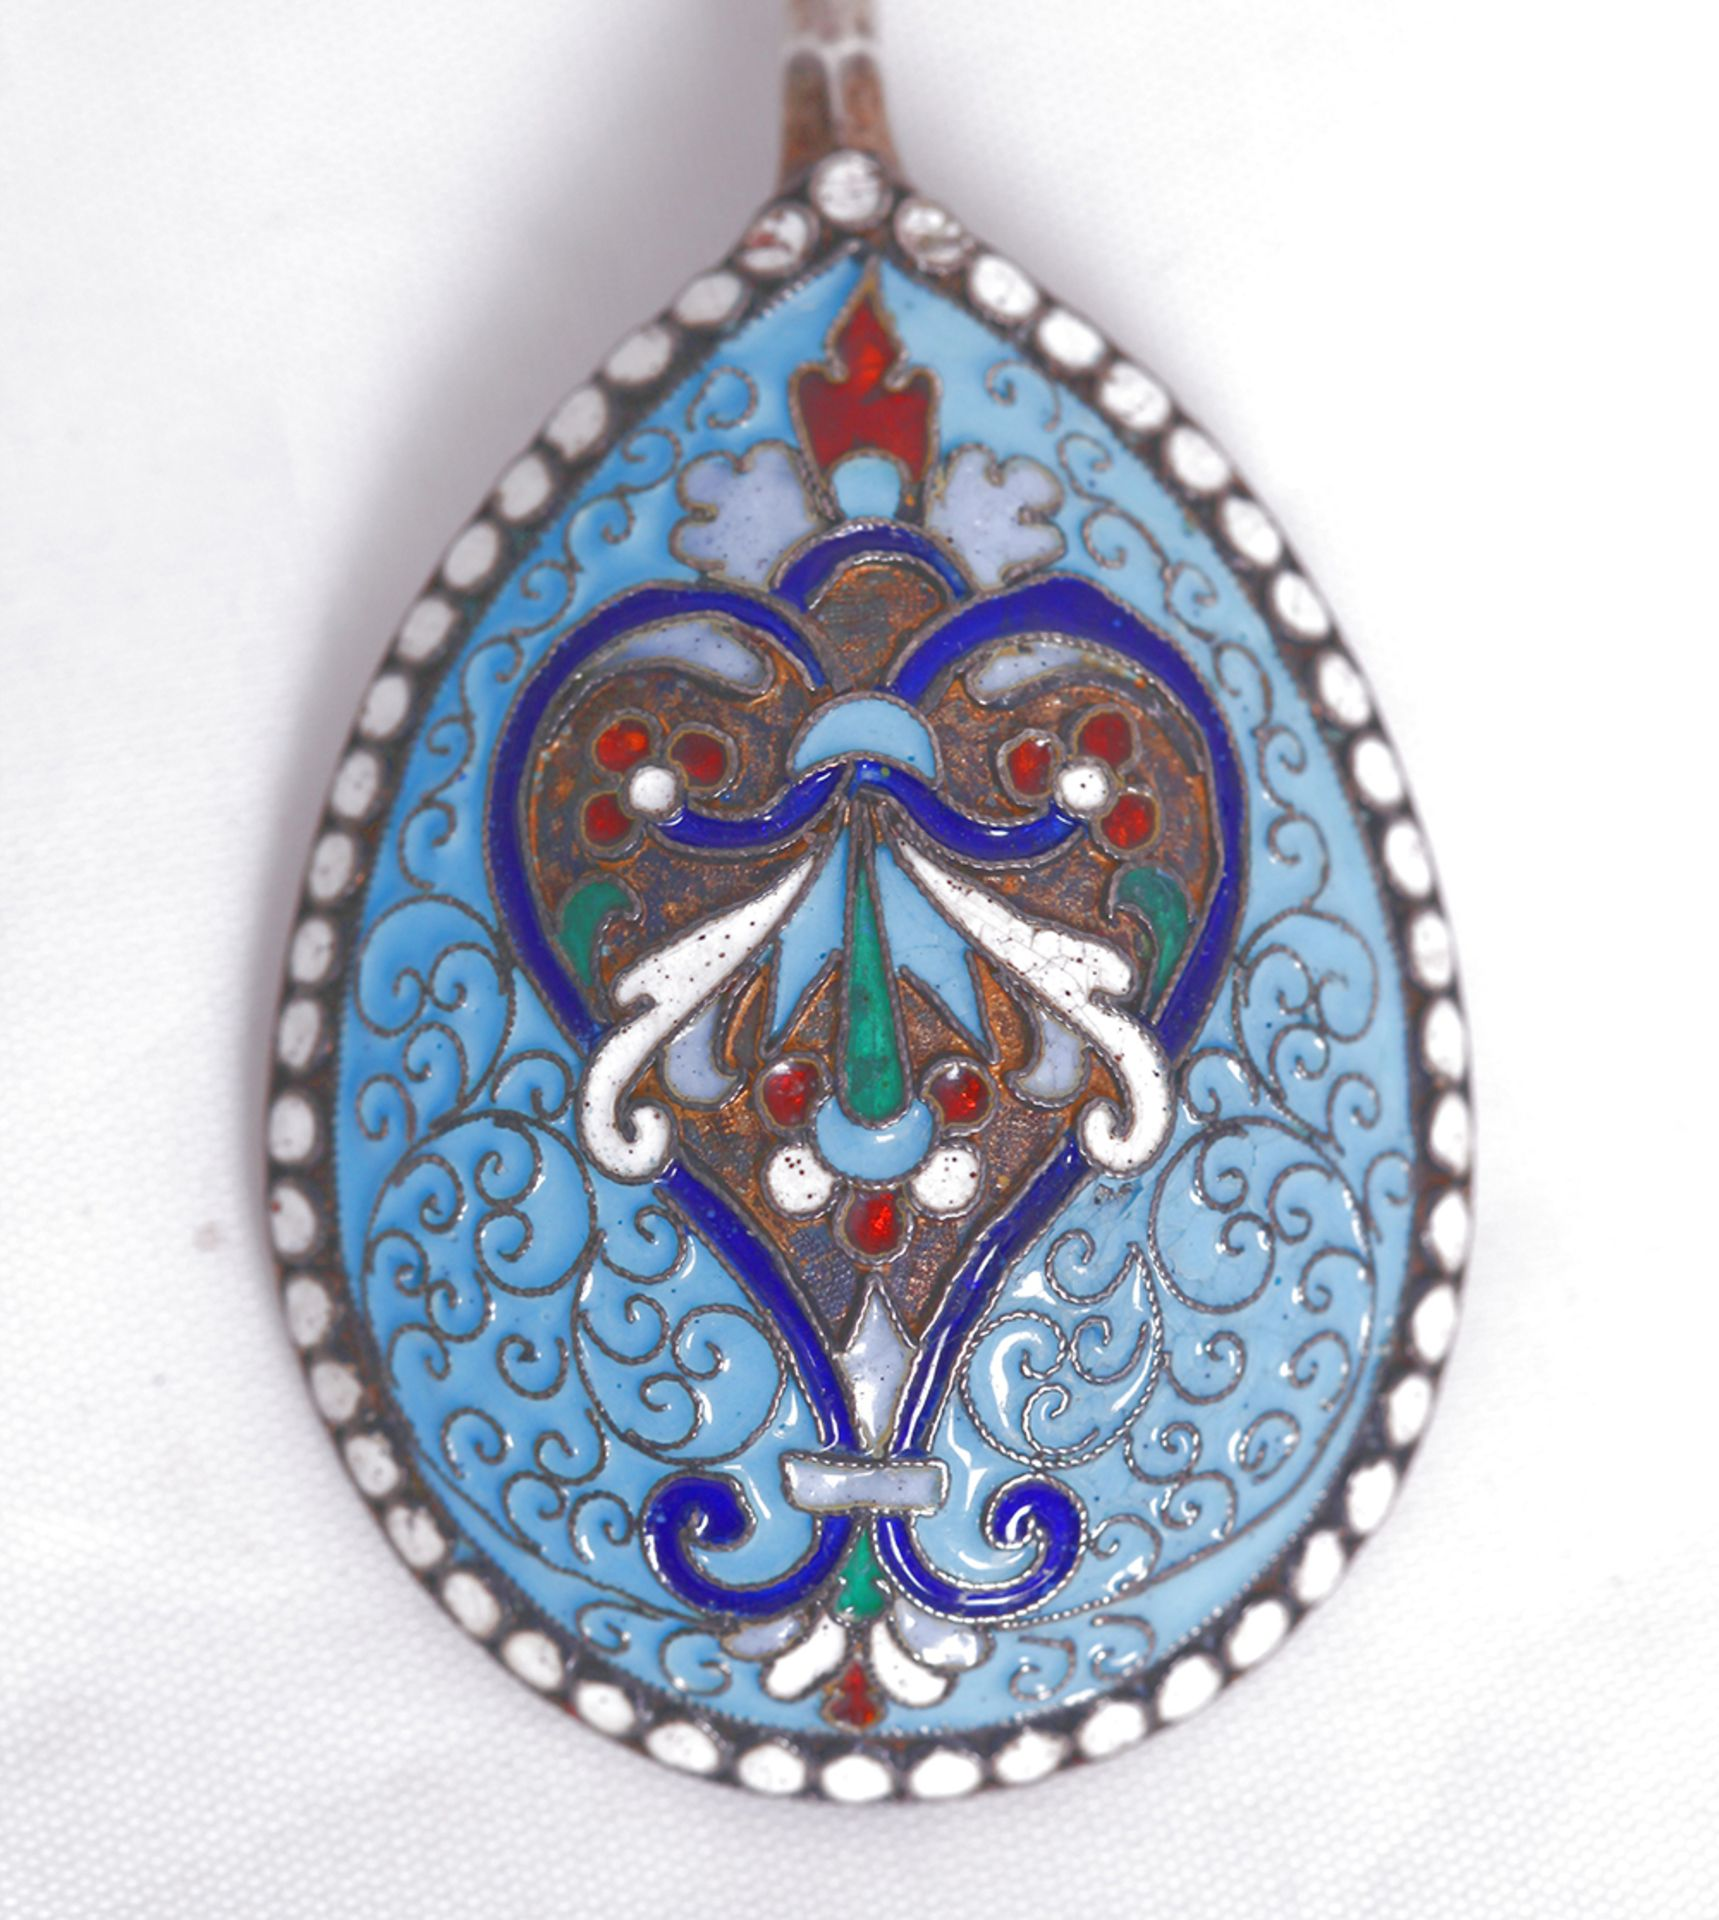 Russian enamel tea spoon. Late 19th- early 20th century. <br>16,5x3,8 cm.  - Bild 4 aus 4